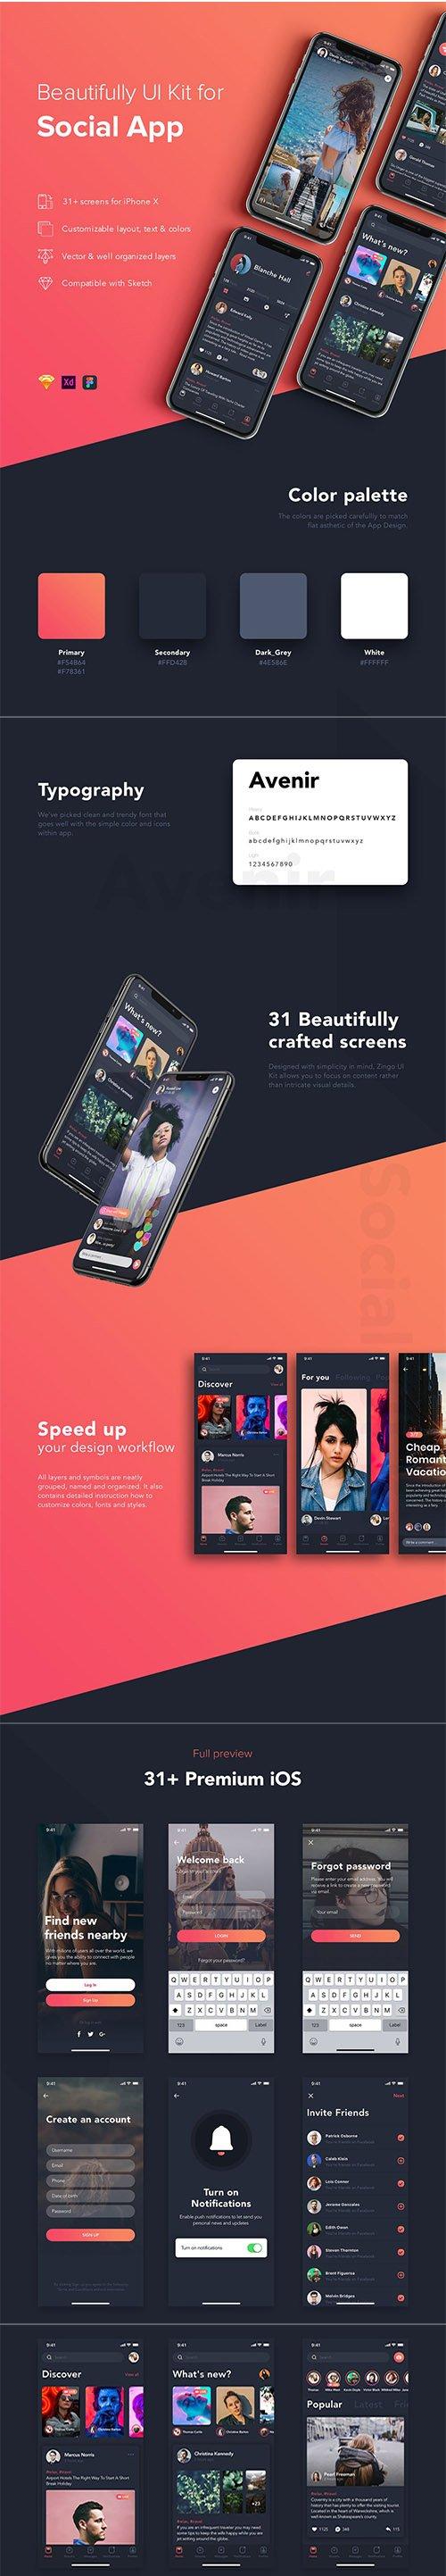 Zingo Social App UI Kit